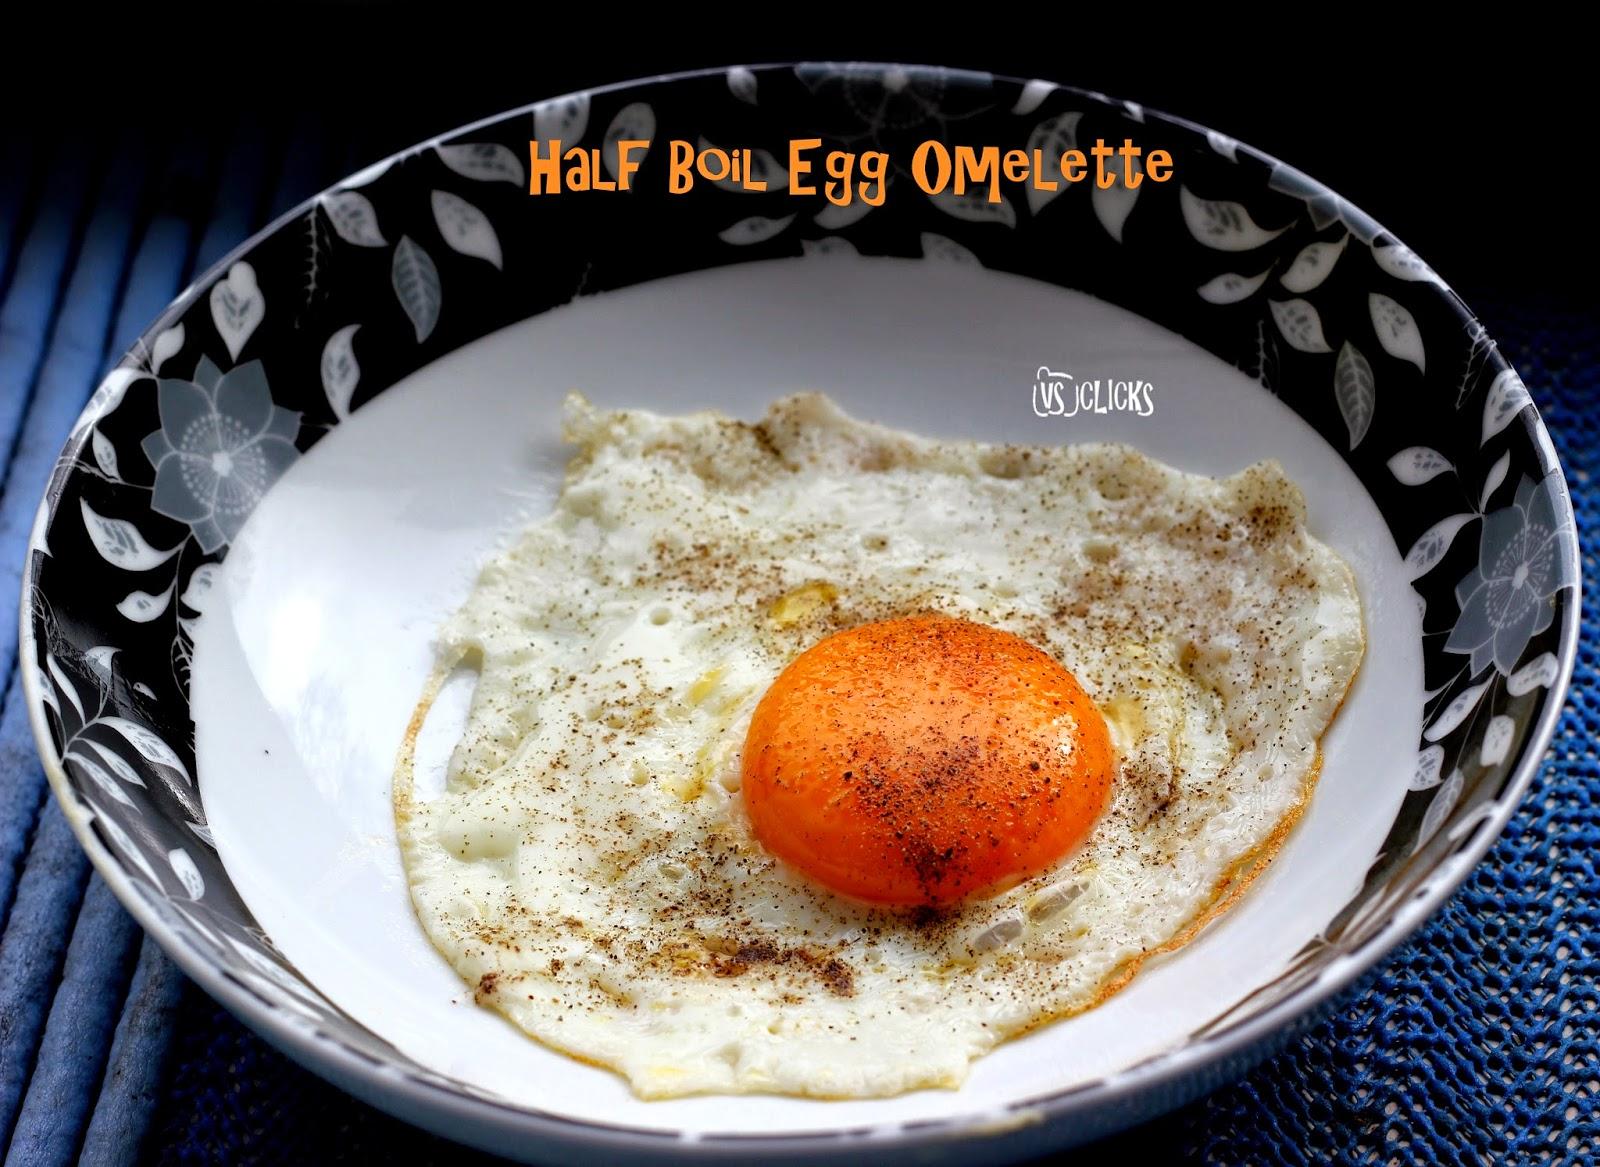 Half Boil Egg Omelette by Vinayaka Vidhya cooked on April 20, 2014